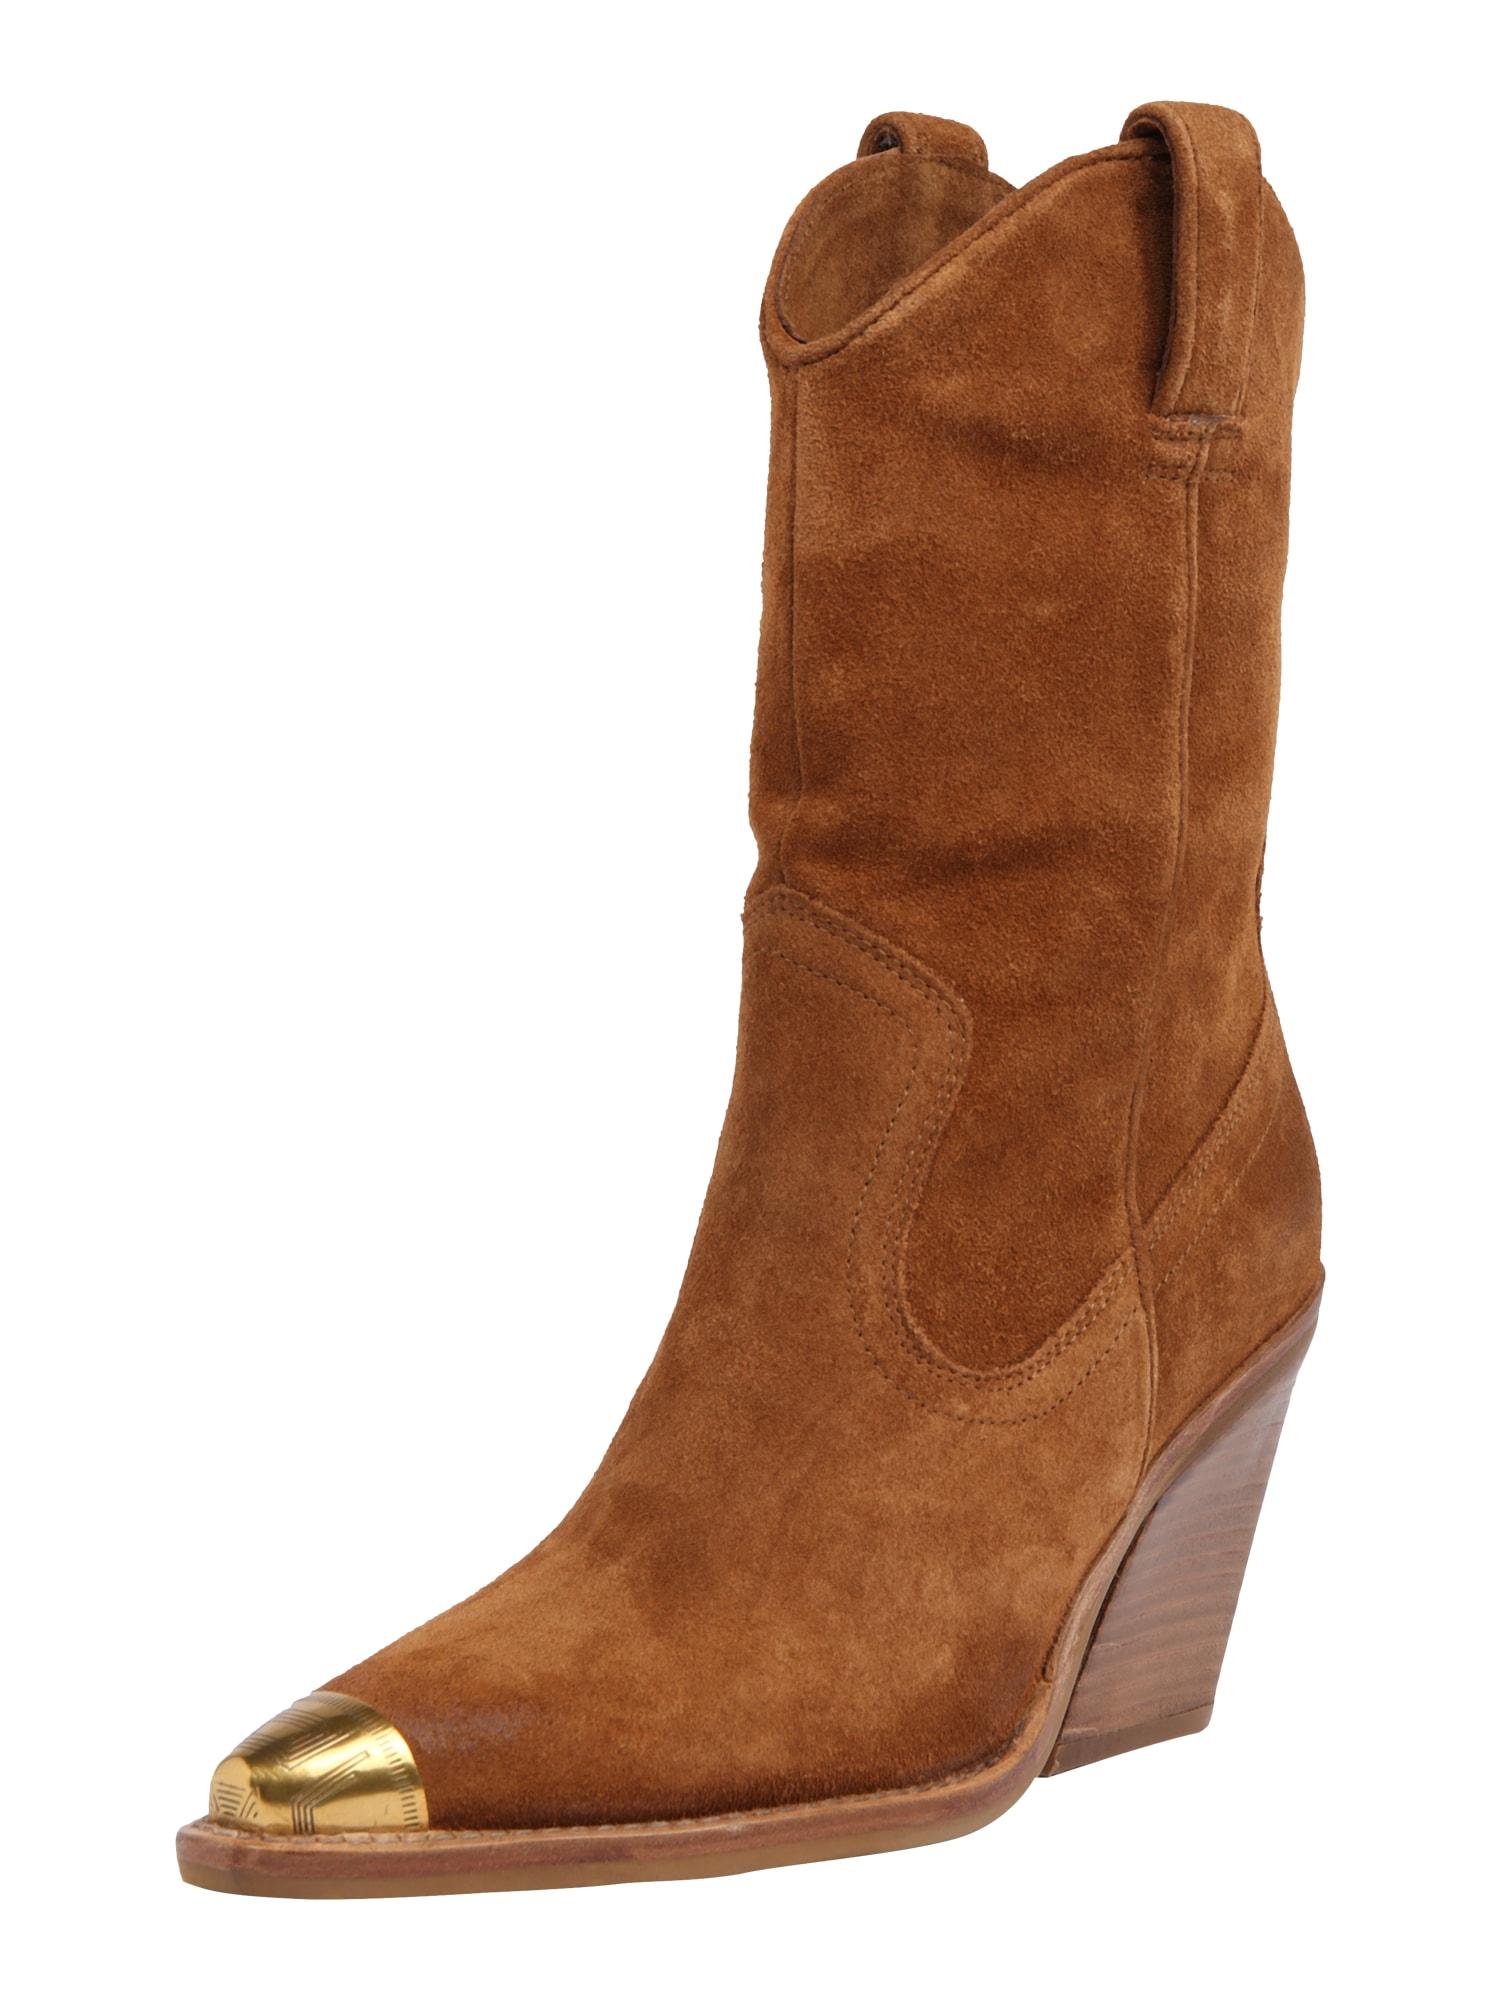 BRONX Kaubojiški batai 'New Kole' ruda (konjako)